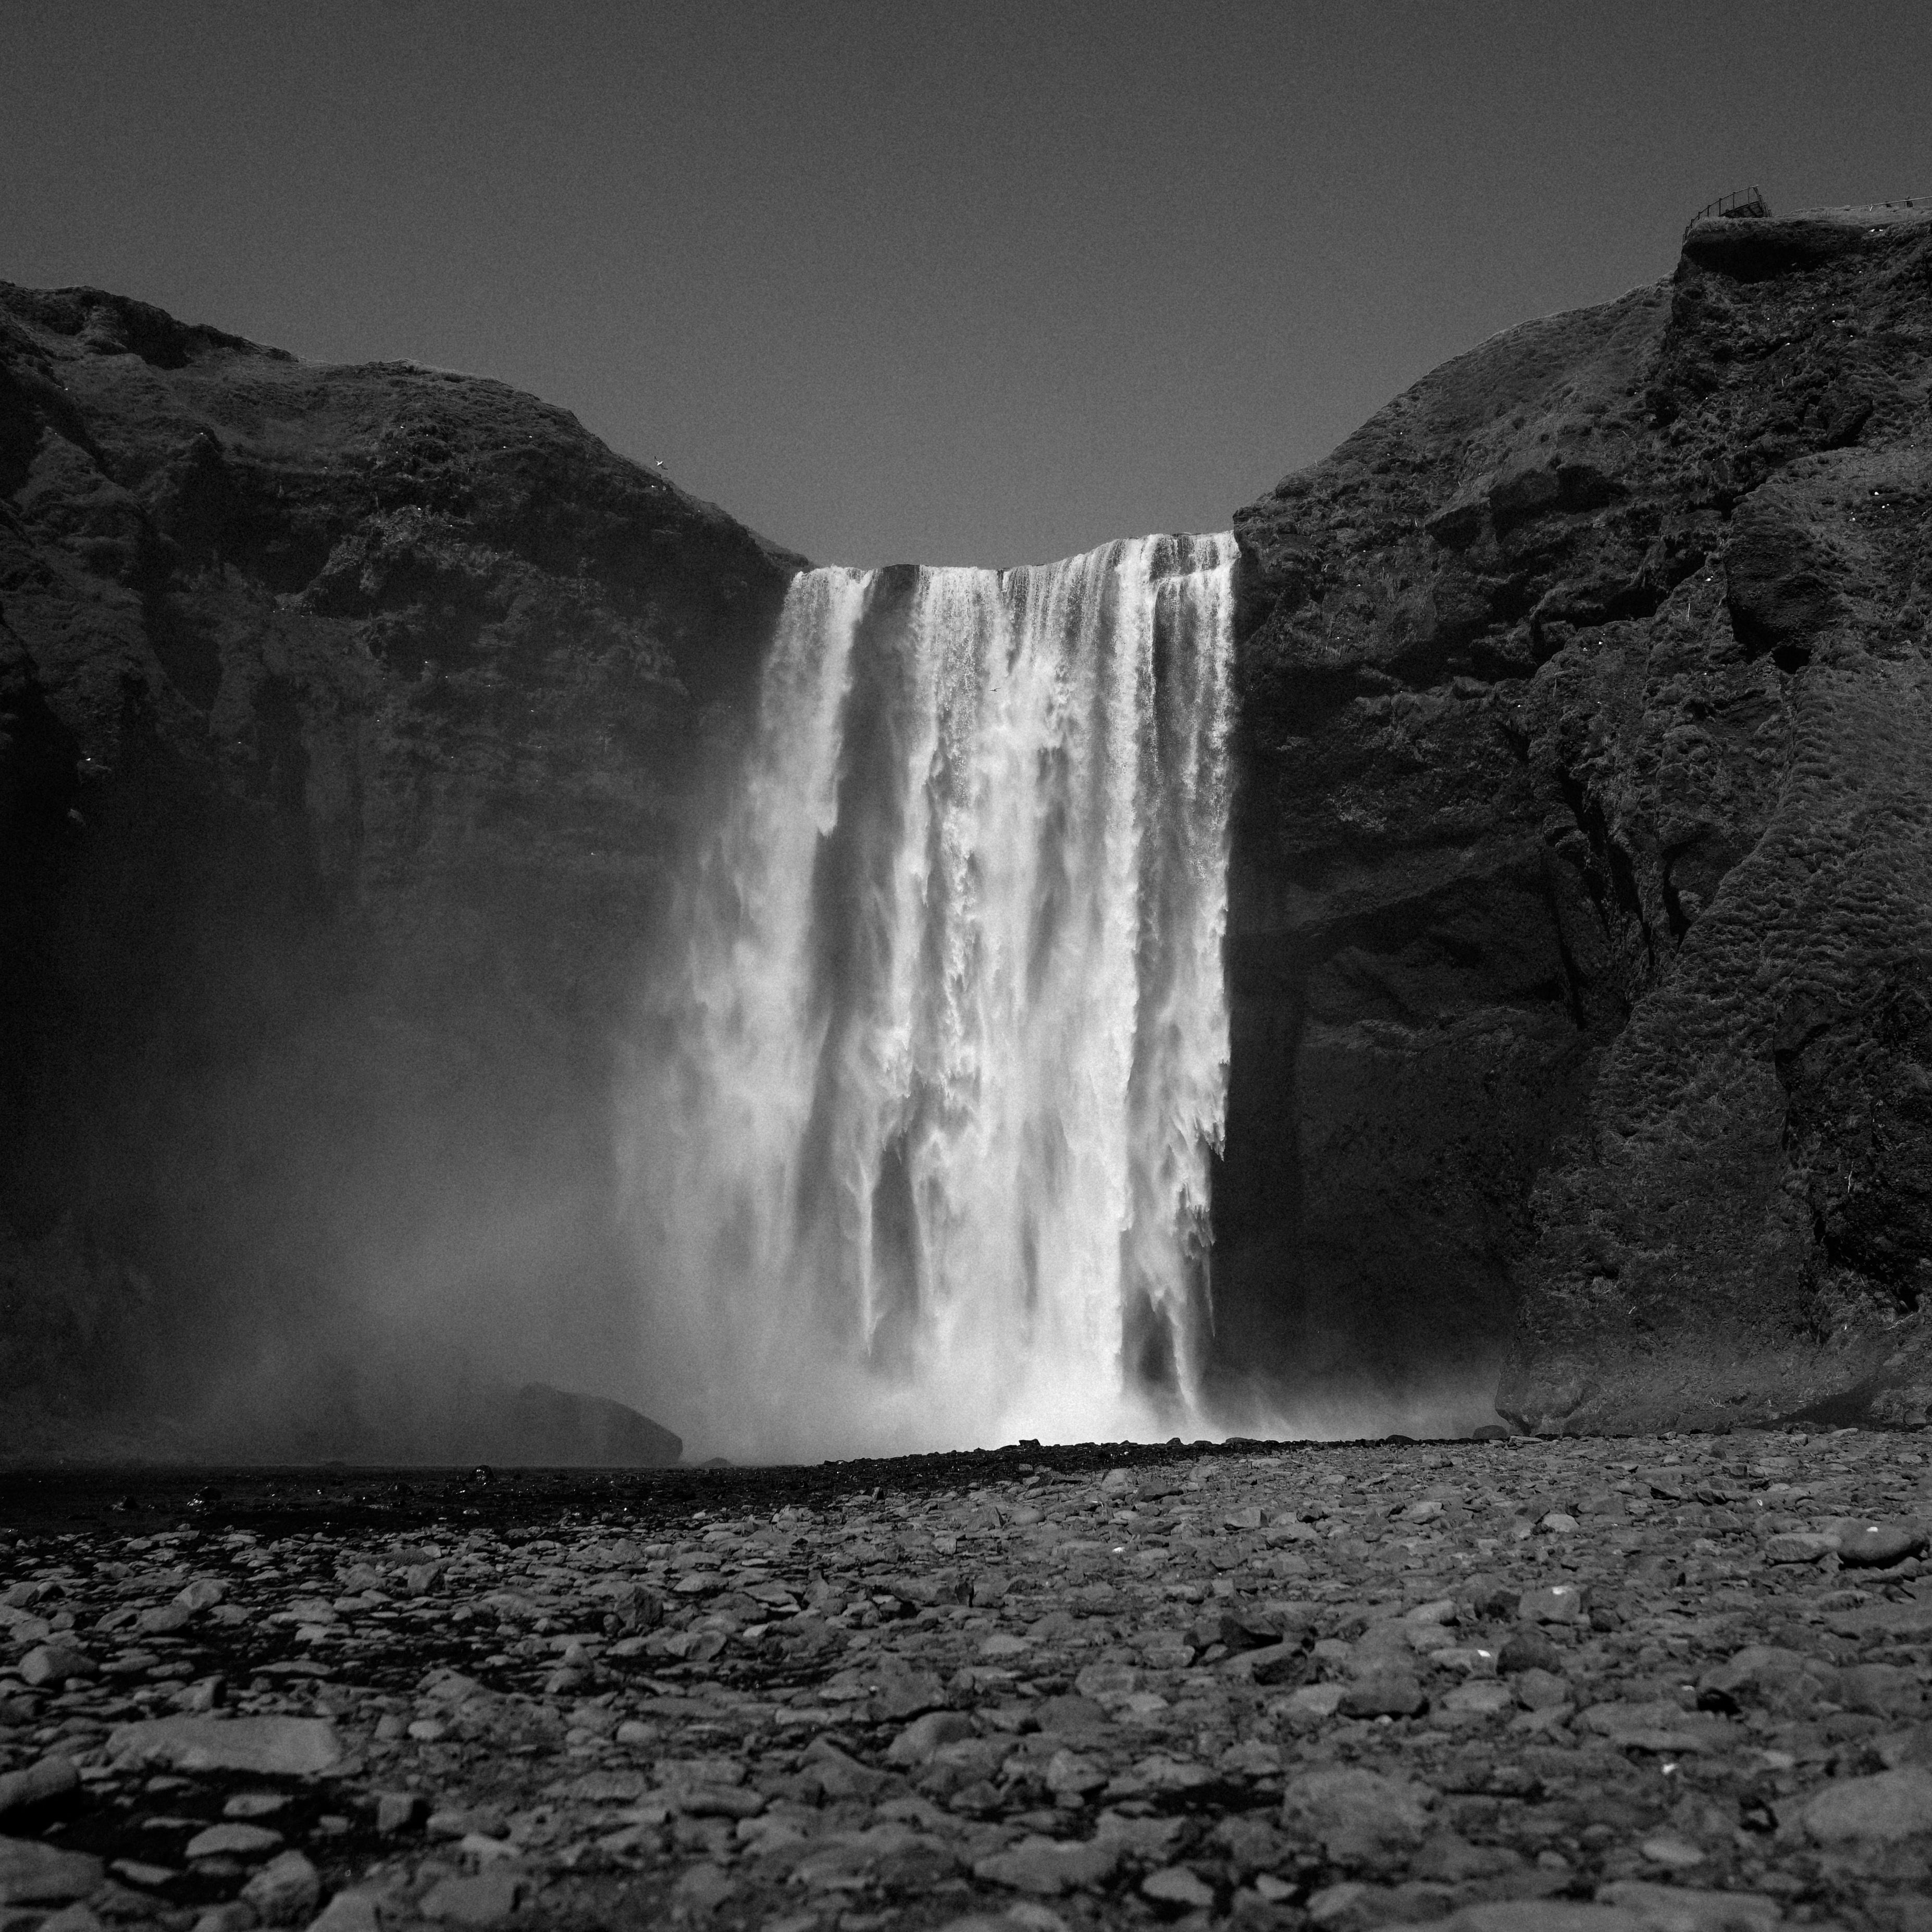 меня черно белые картинки водопад земле обитало